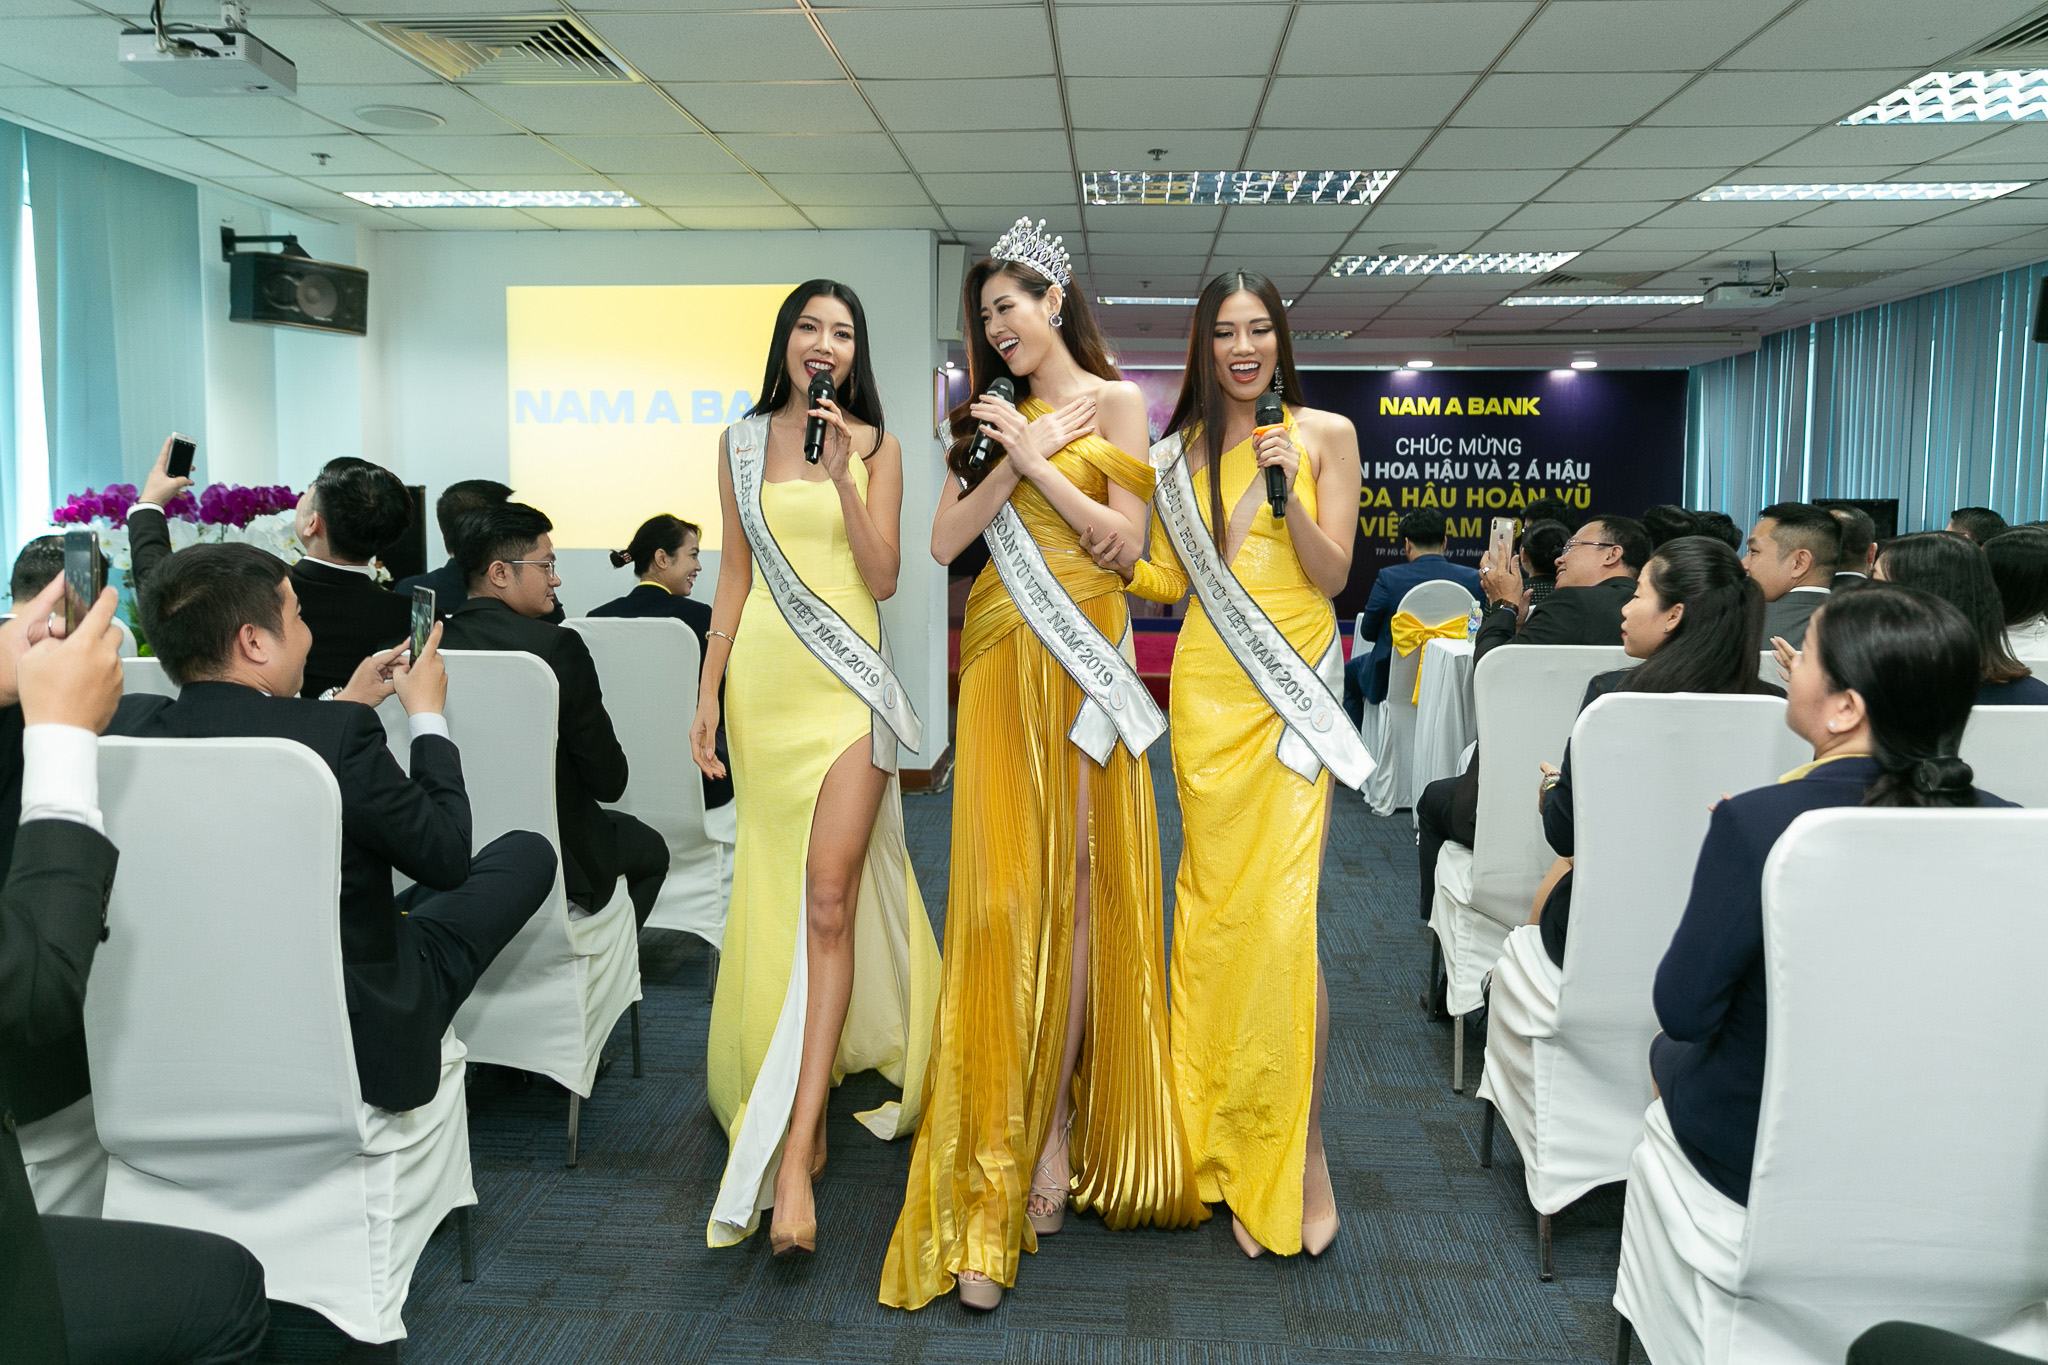 Top 3 Hoa Hau Hoan Vu Viet Nam 2019_Event Nam A Bank (45)